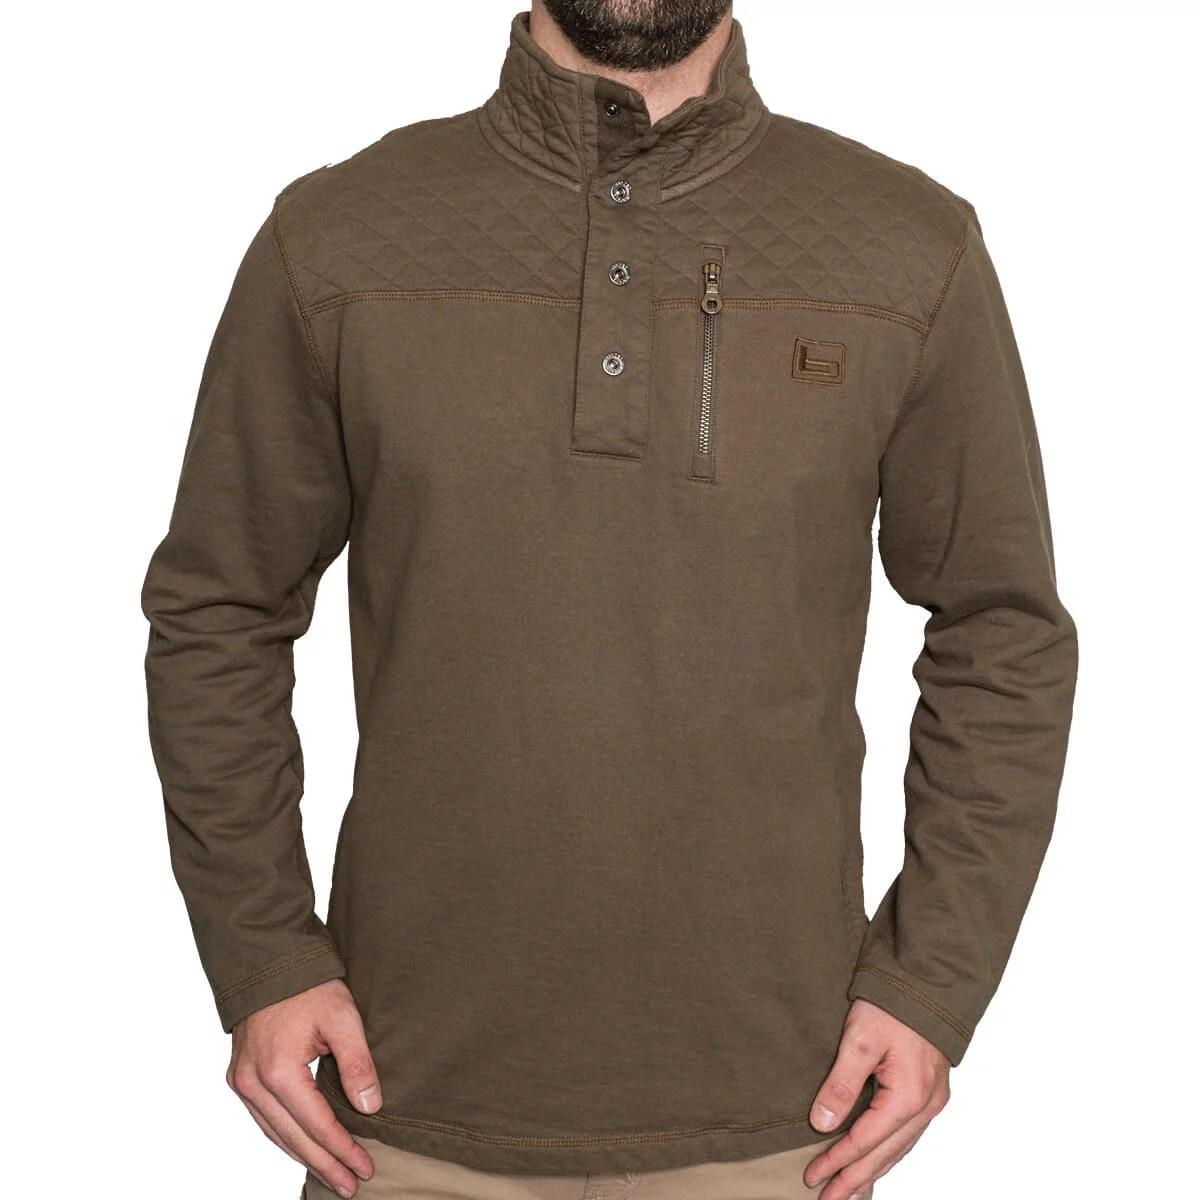 4223957962e0 Pullover In Spanish | Spanish Club T Shirts Customize Spanish Club ...